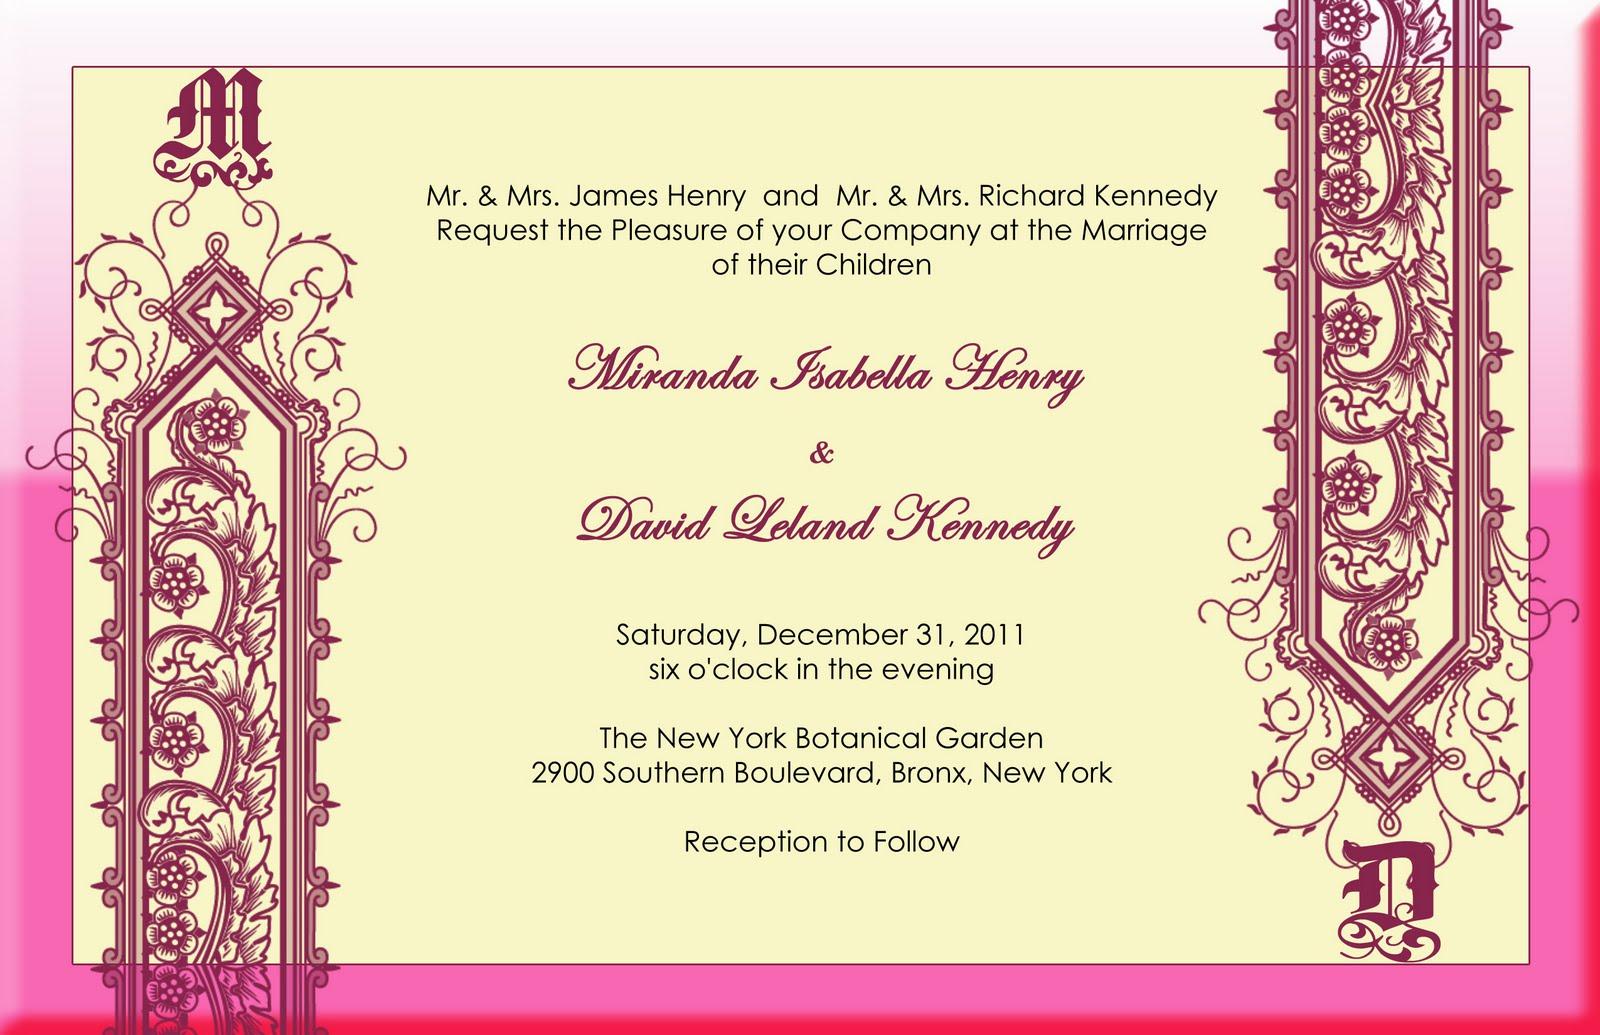 Wedding Invitation In Hindi: Felicia's Blog: Modern Indian Wedding